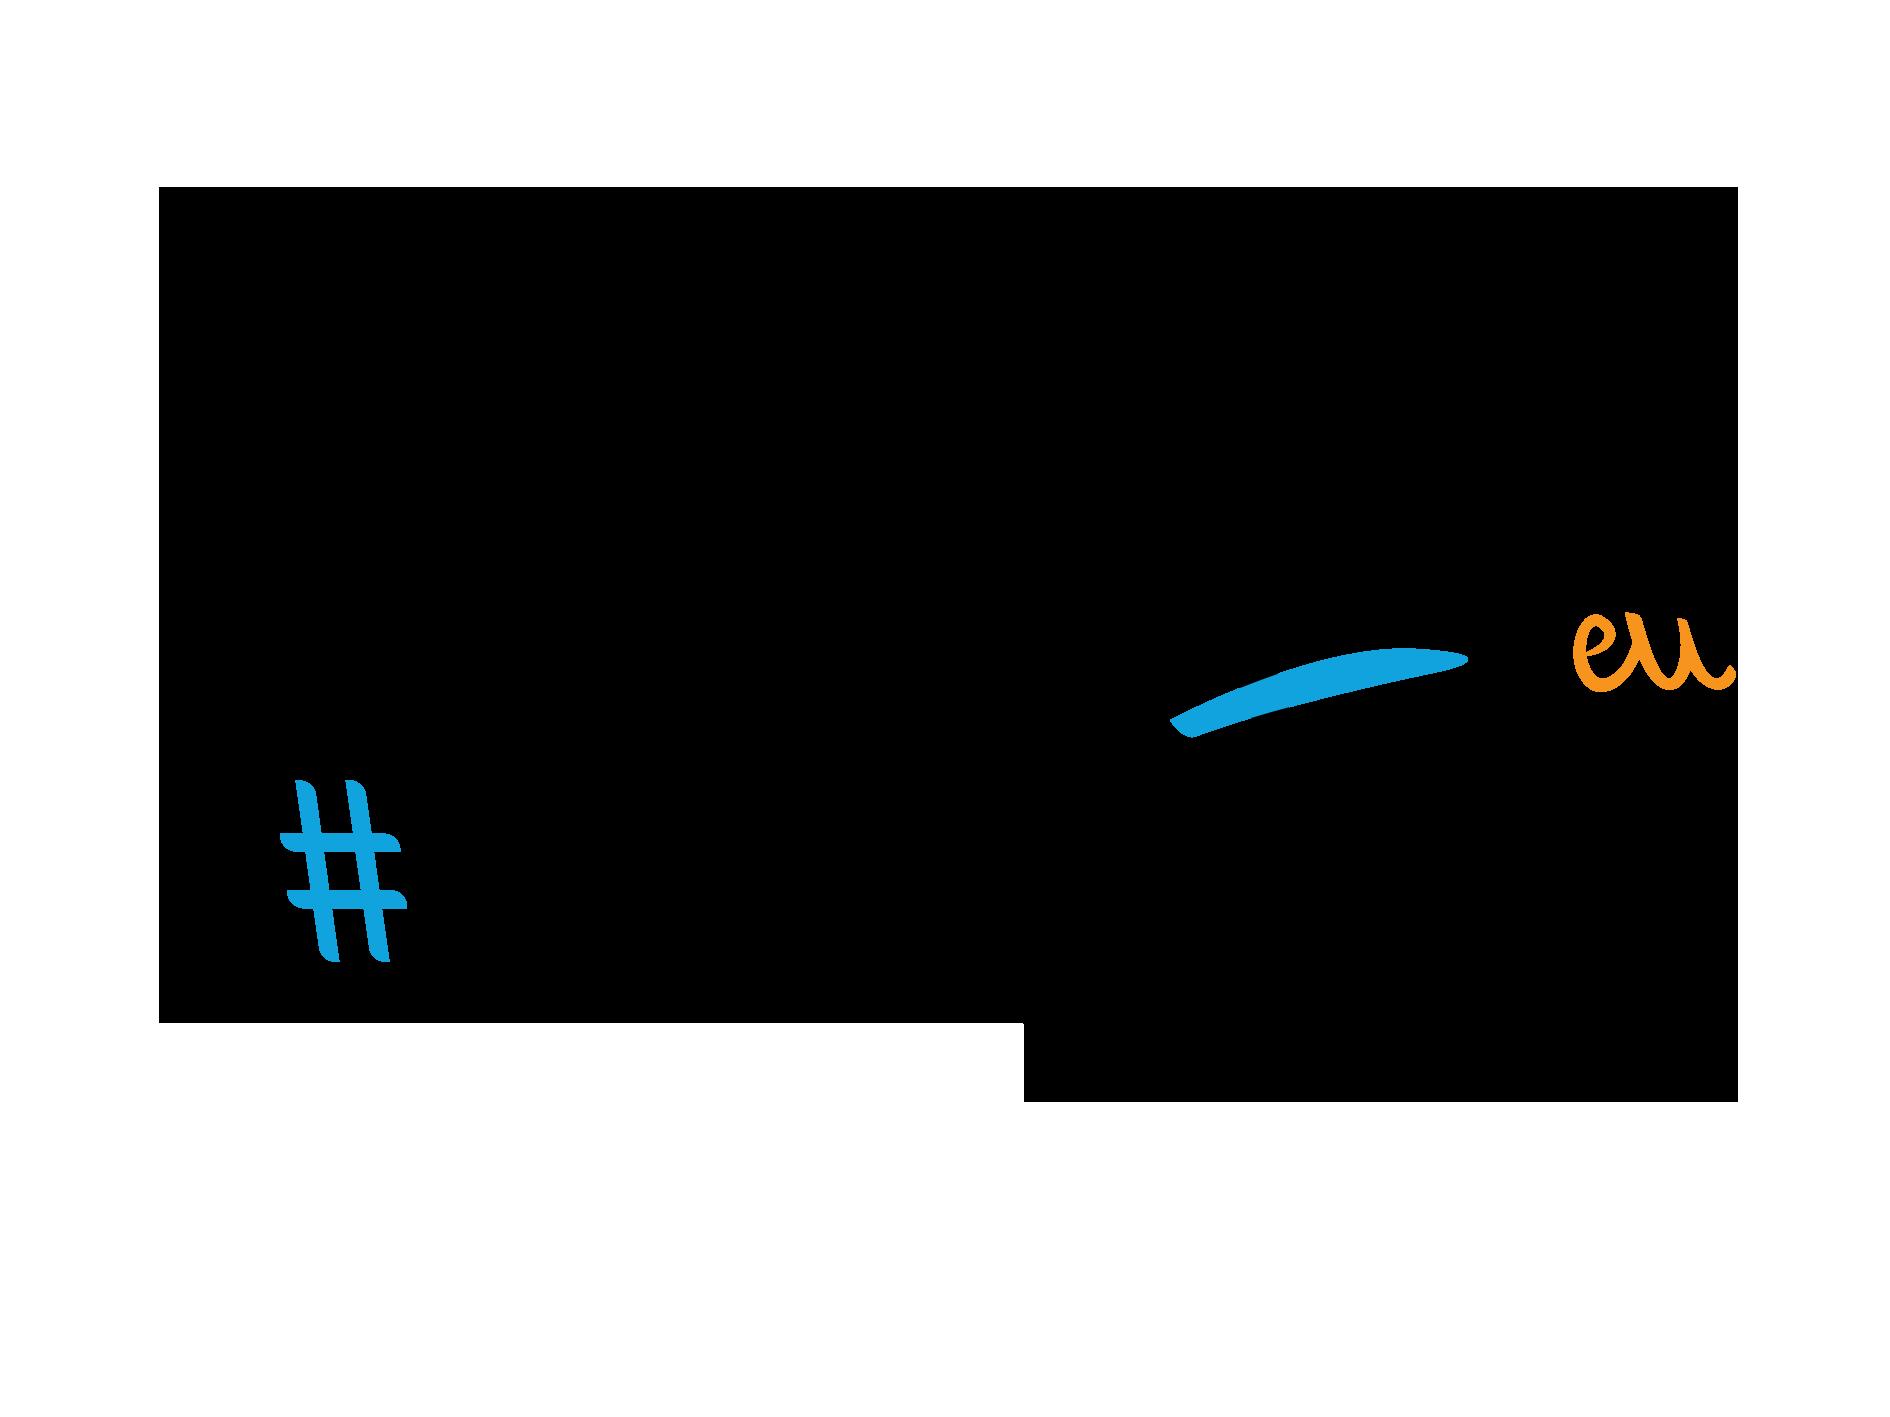 logo_precestuj